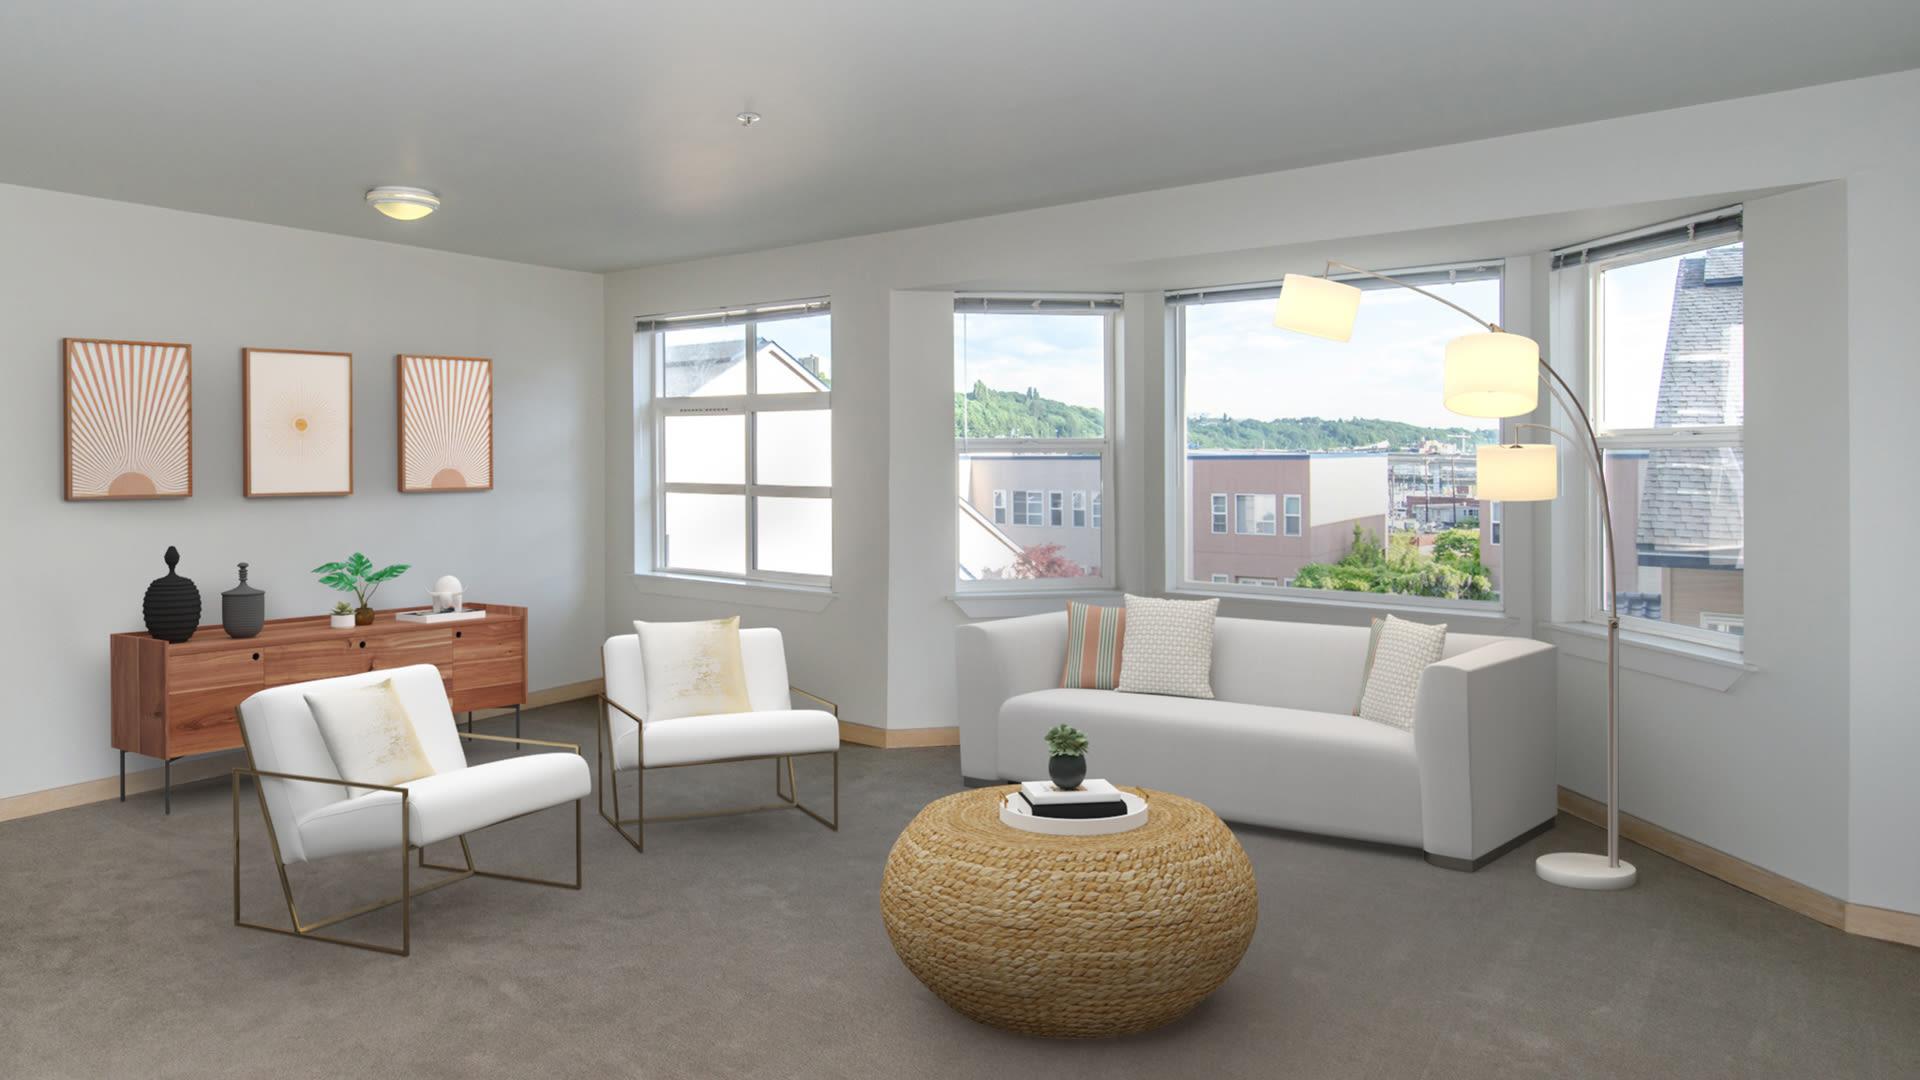 Uwajimaya Village Apartments - Living Room with Bay Windows